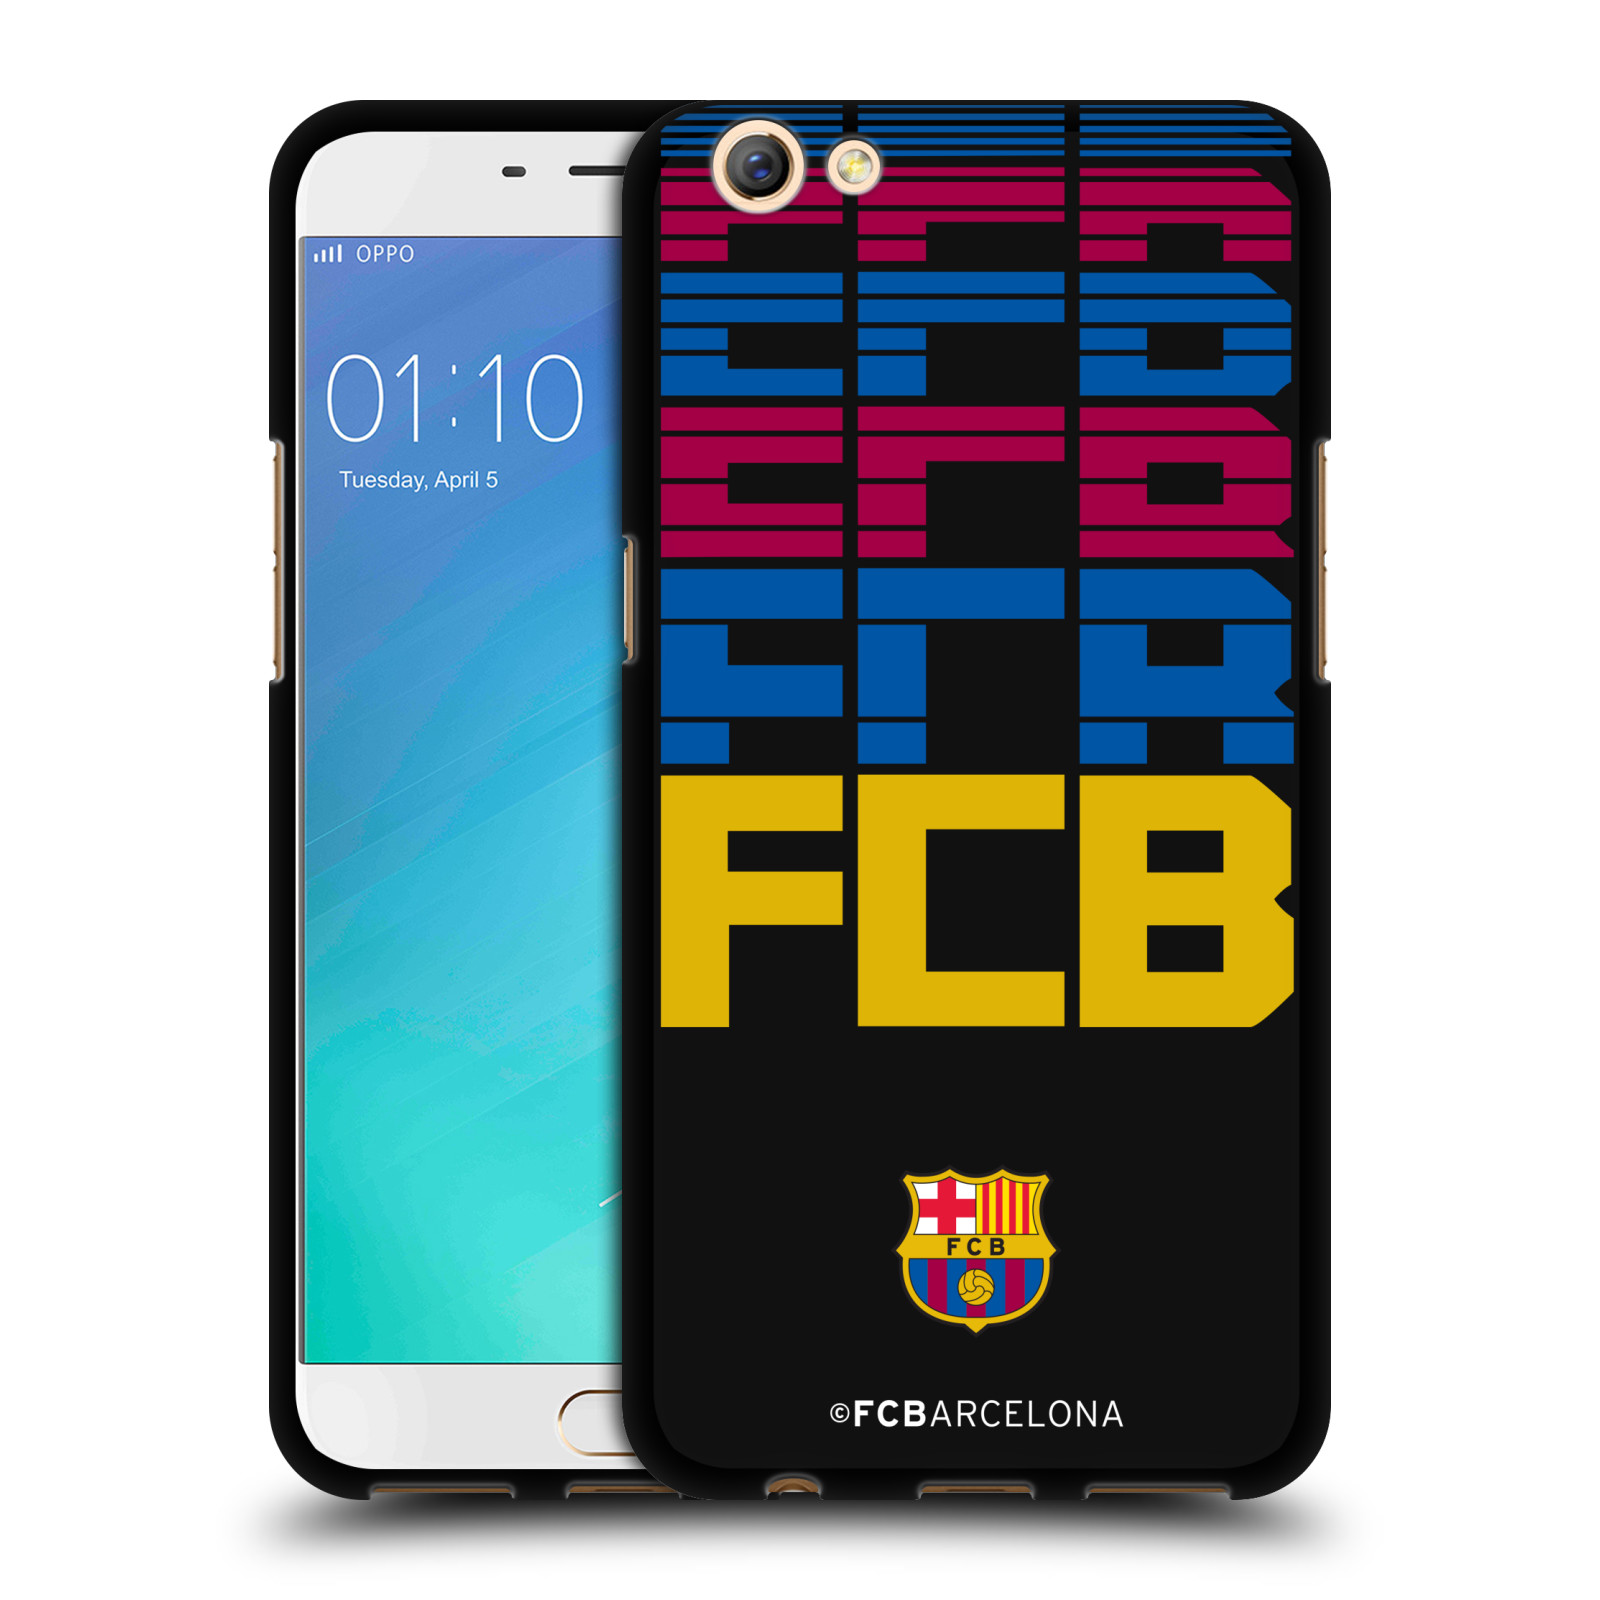 OFFICIAL-FC-BARCELONA-2017-18-CAMPIONS-BLACK-SOFT-GEL-CASE-FOR-OPPO-PHONES